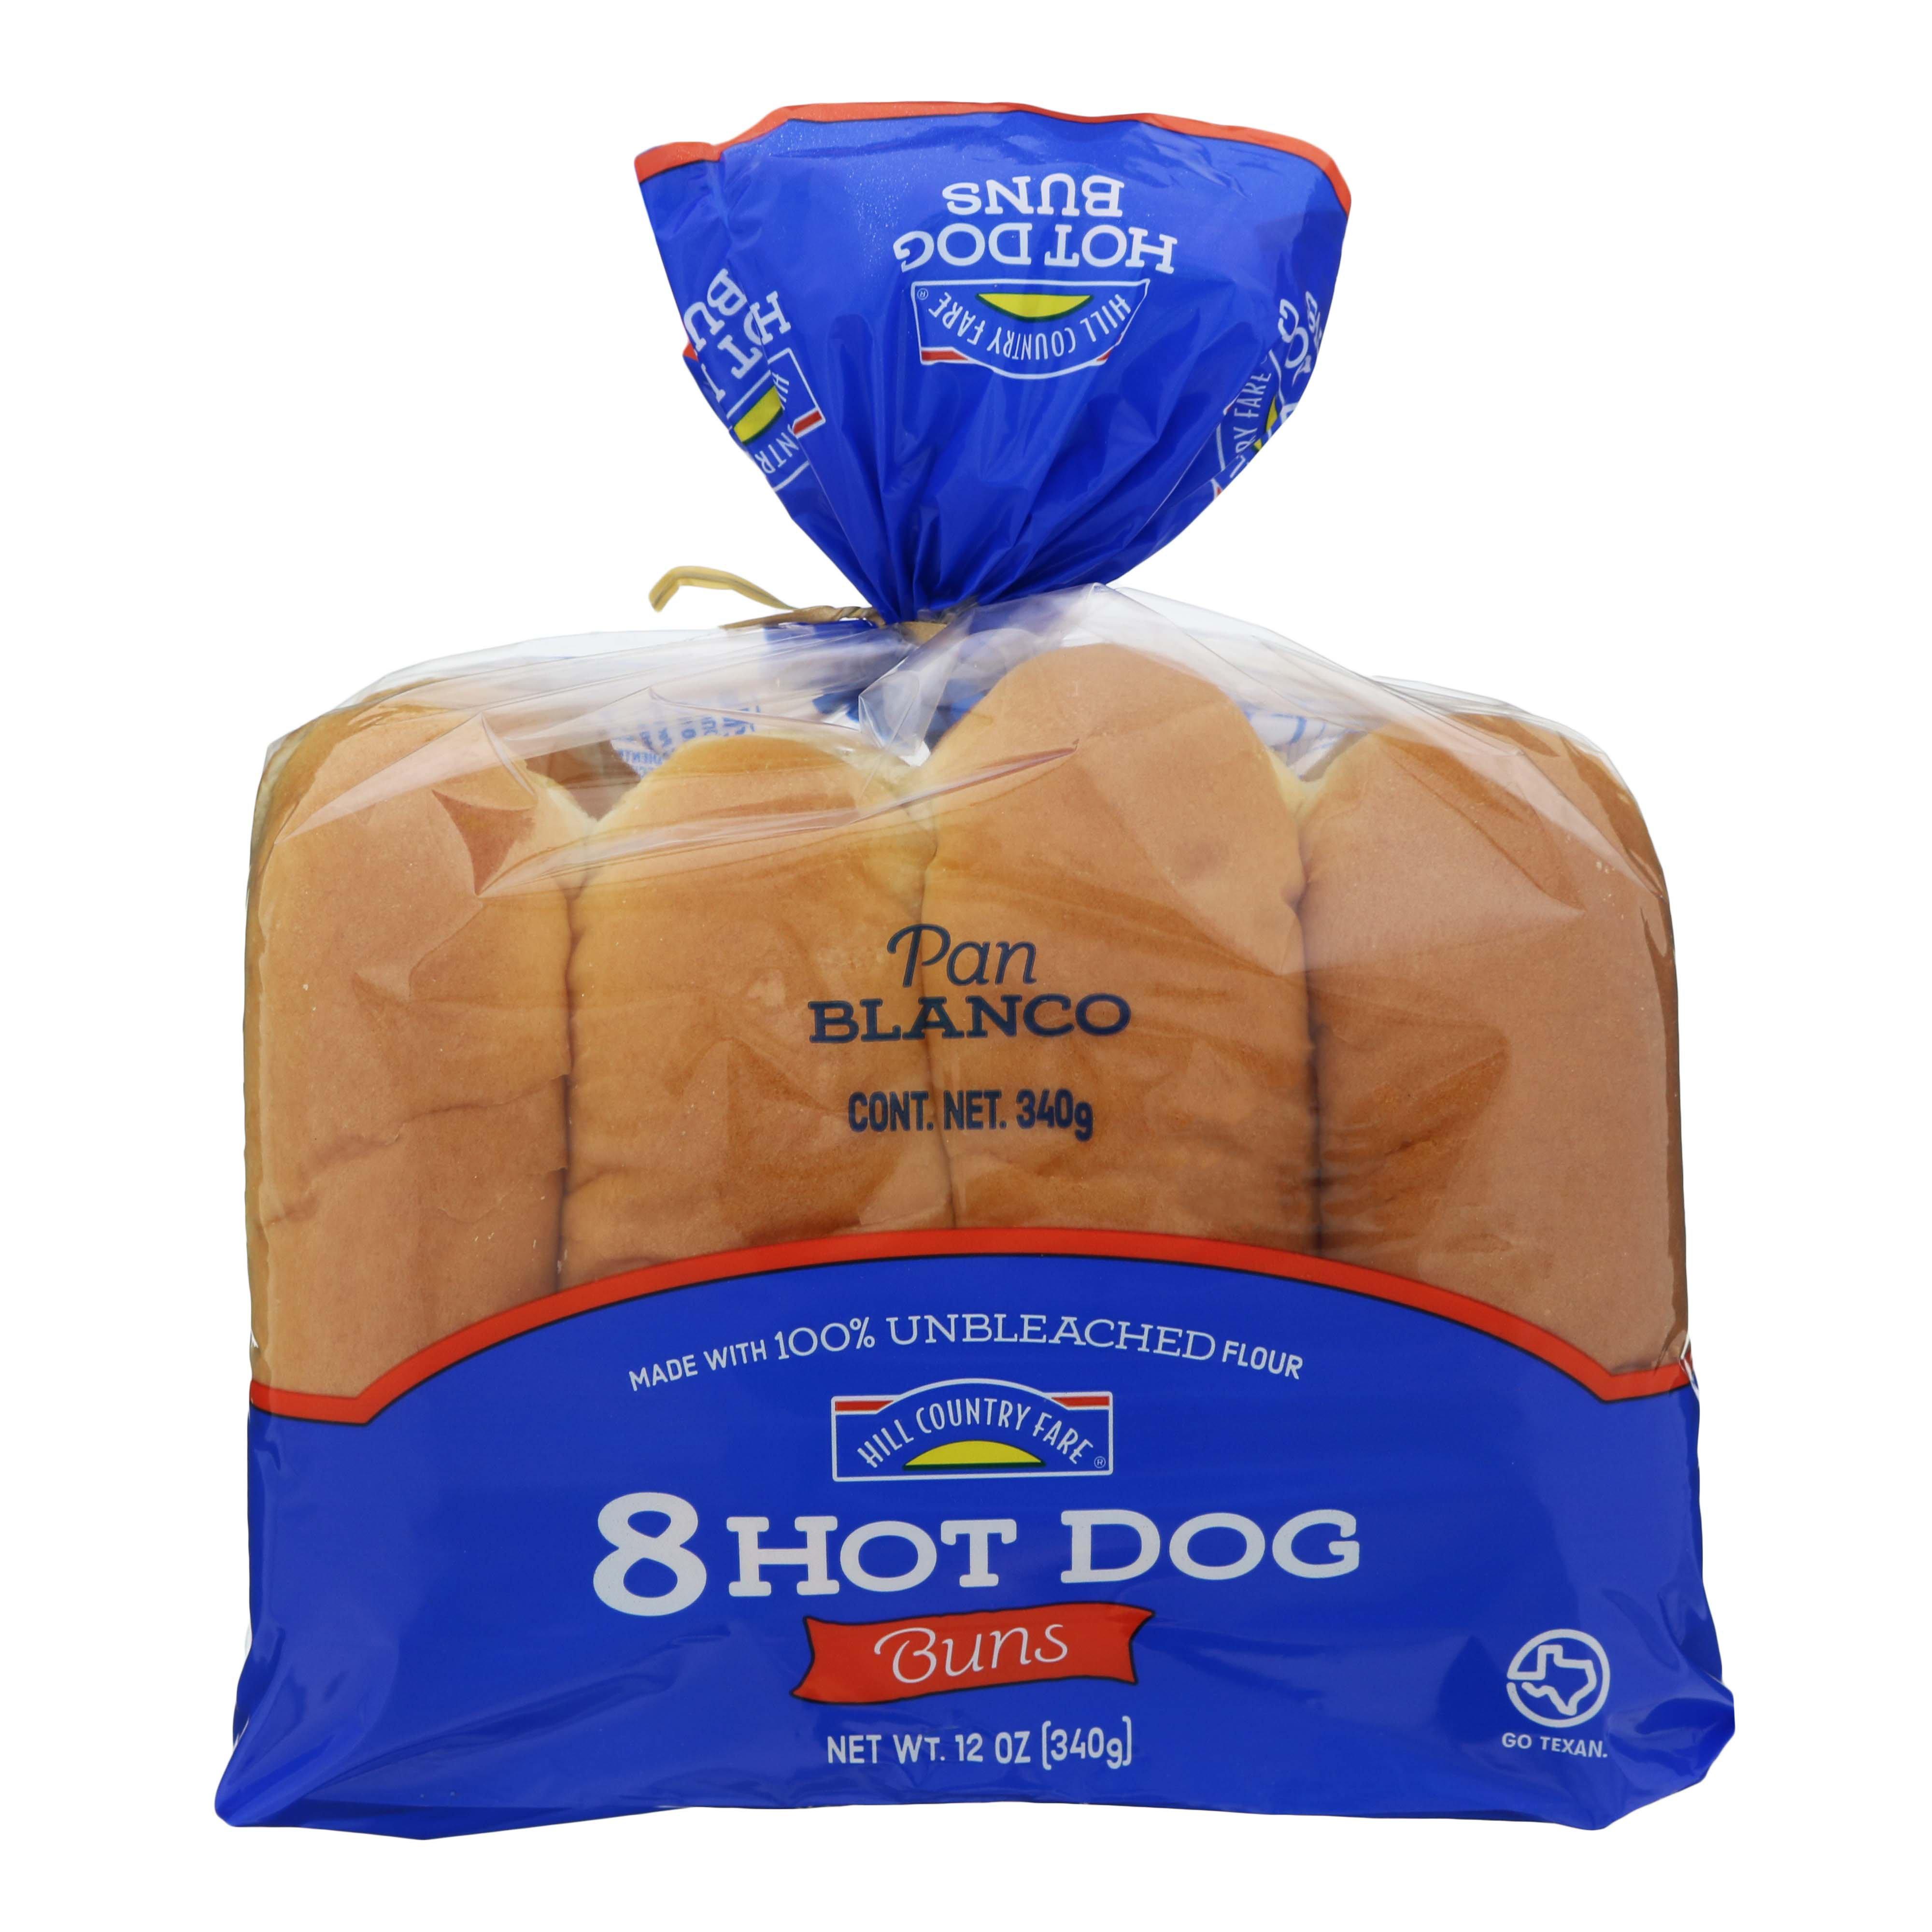 Hill Country Fare Hot Dog Buns Shop Bread At H E B